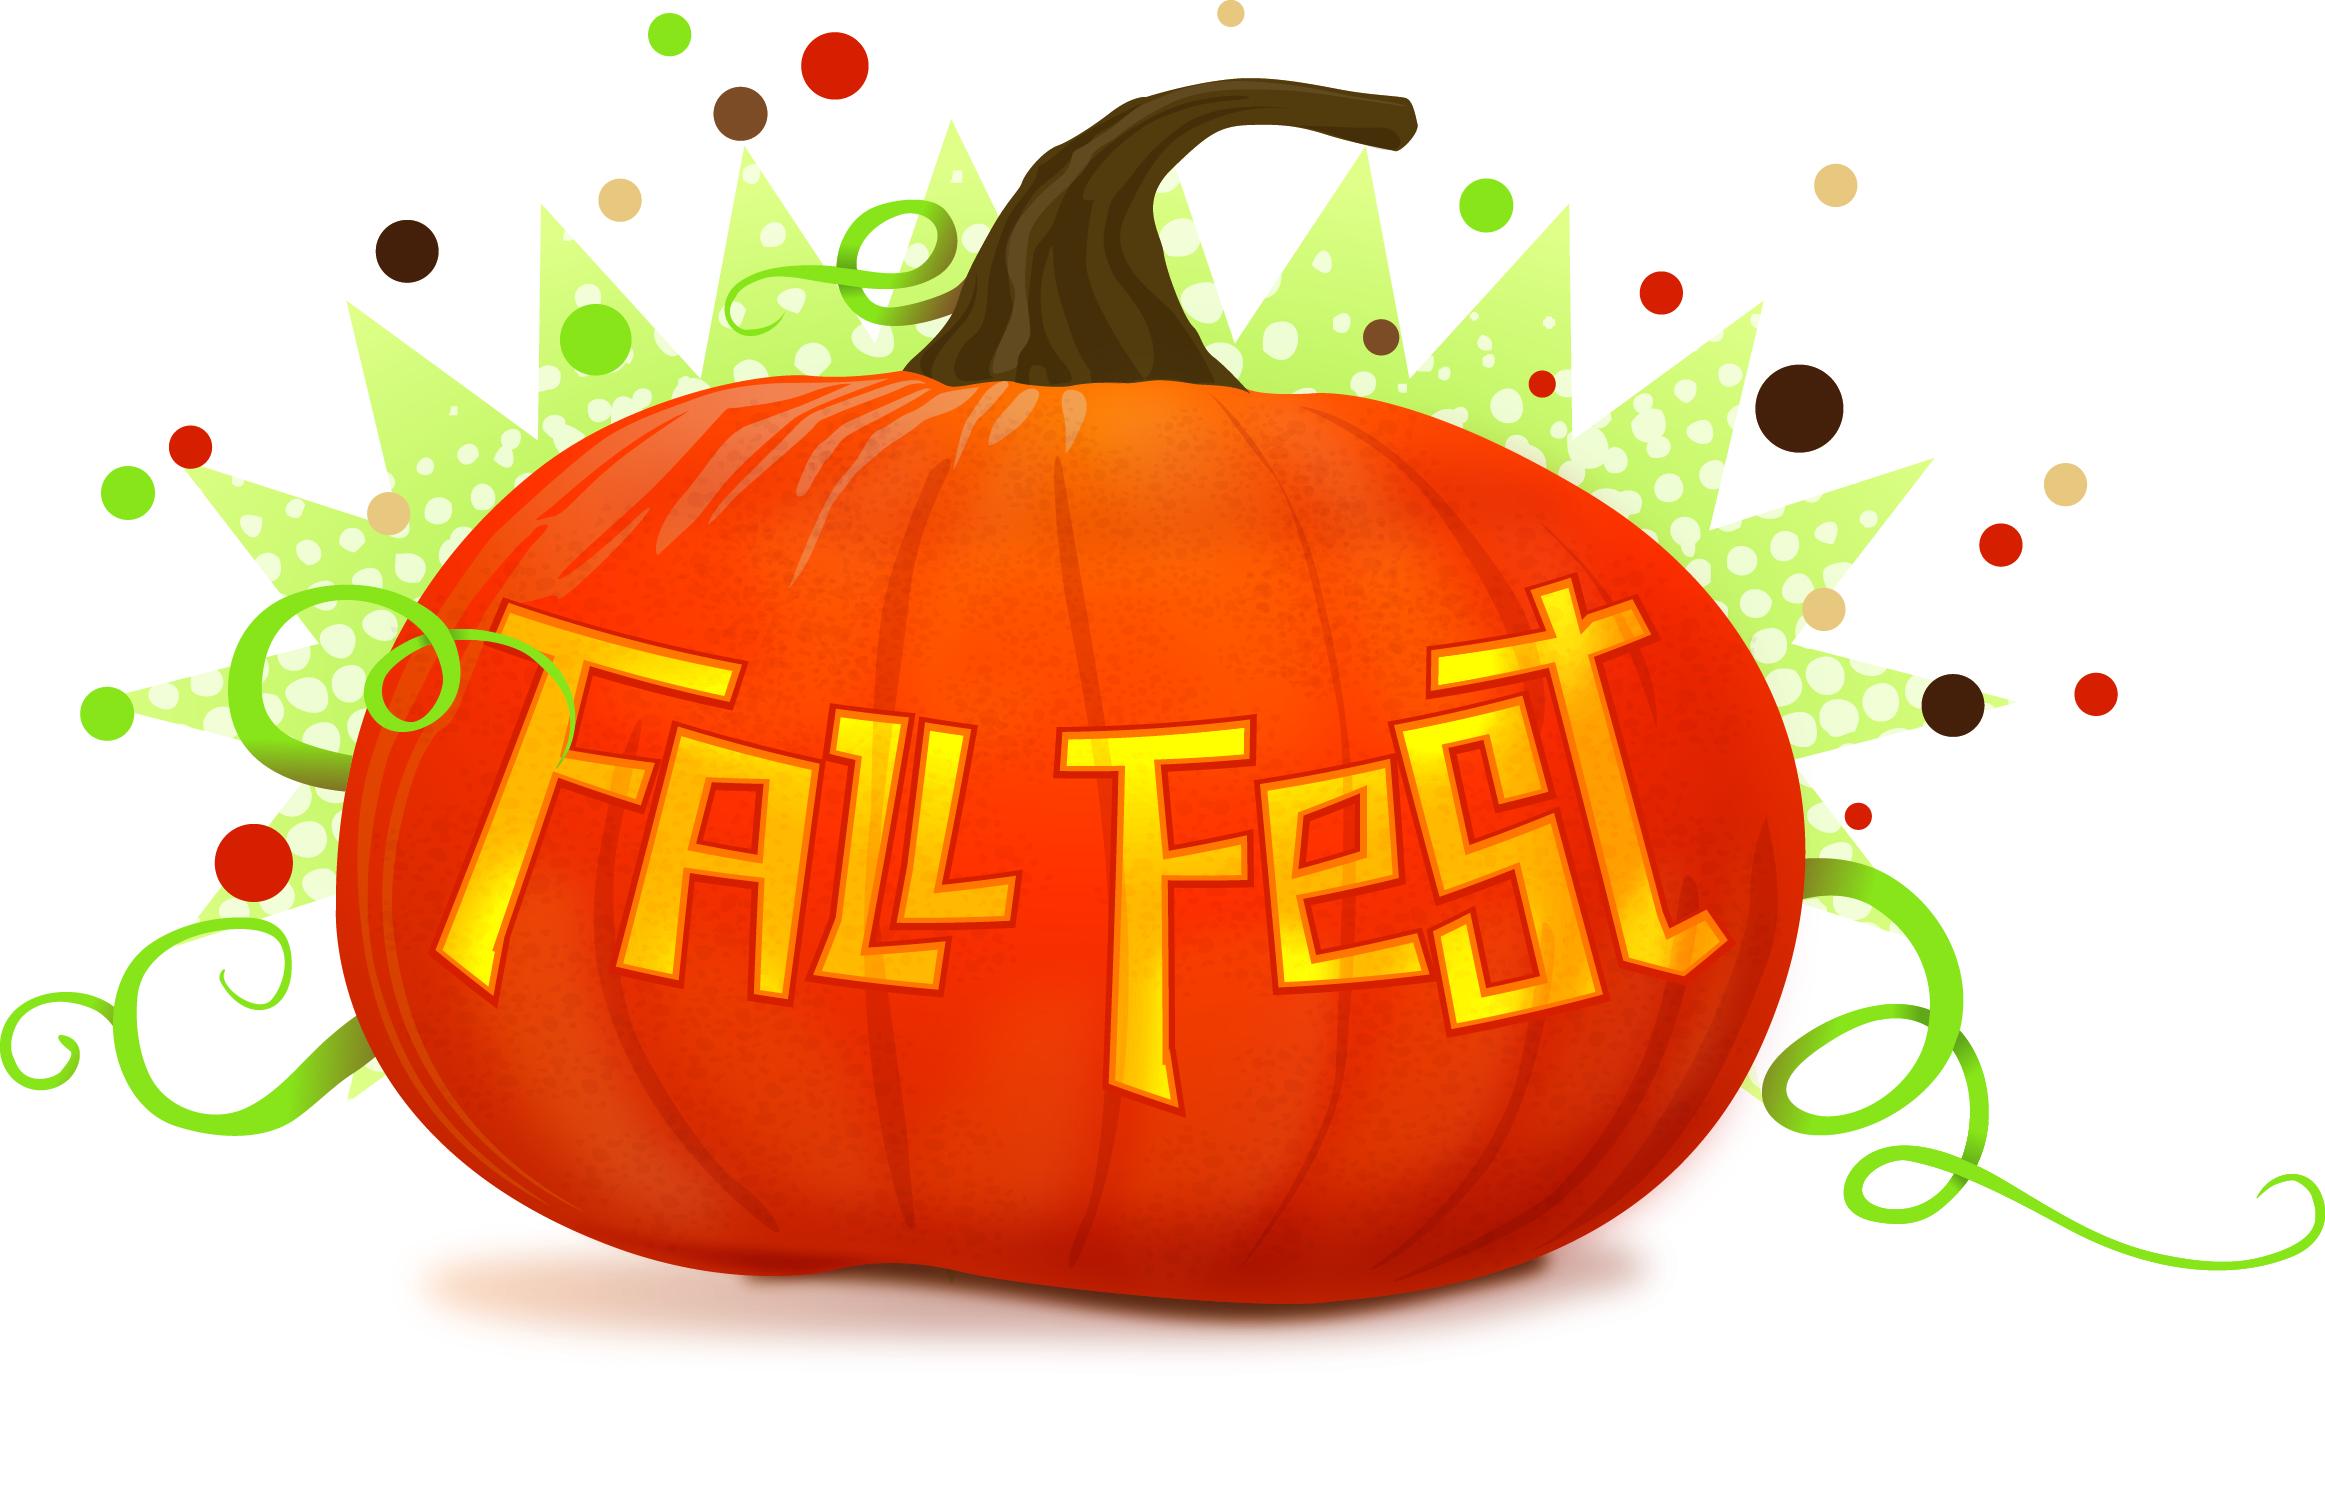 Fall festival clipart 4